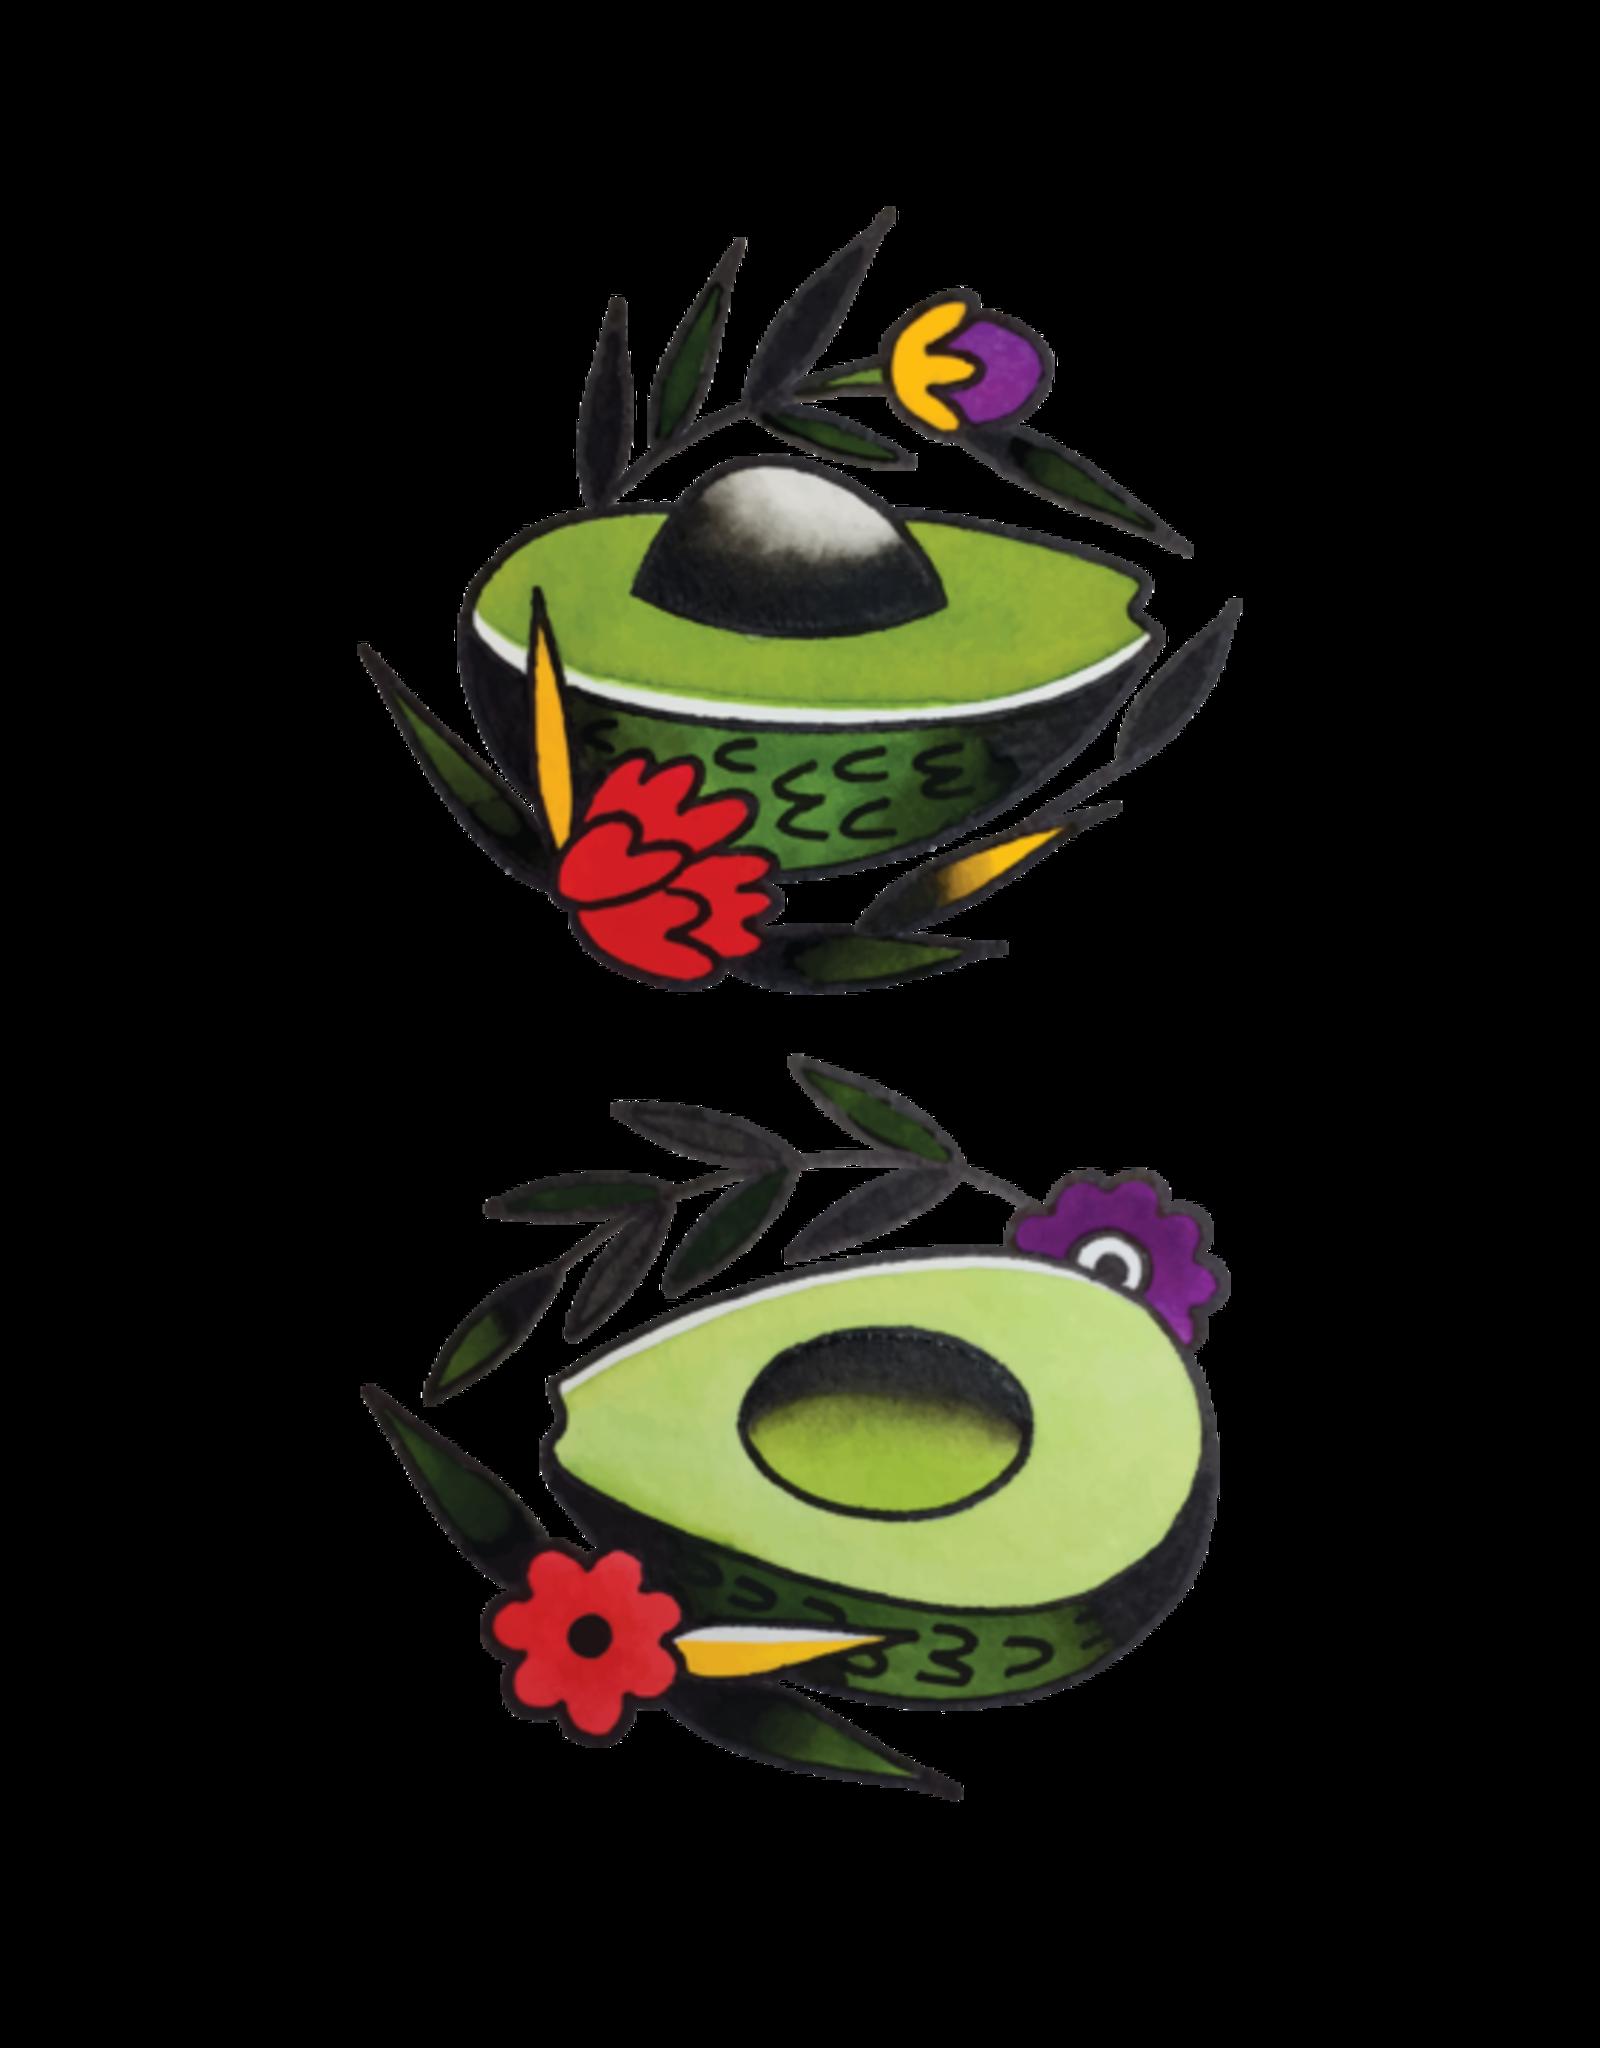 Tattly Avocado Flash by Jessi Preston - - Tattly Temporary Tattoos (Pairs)